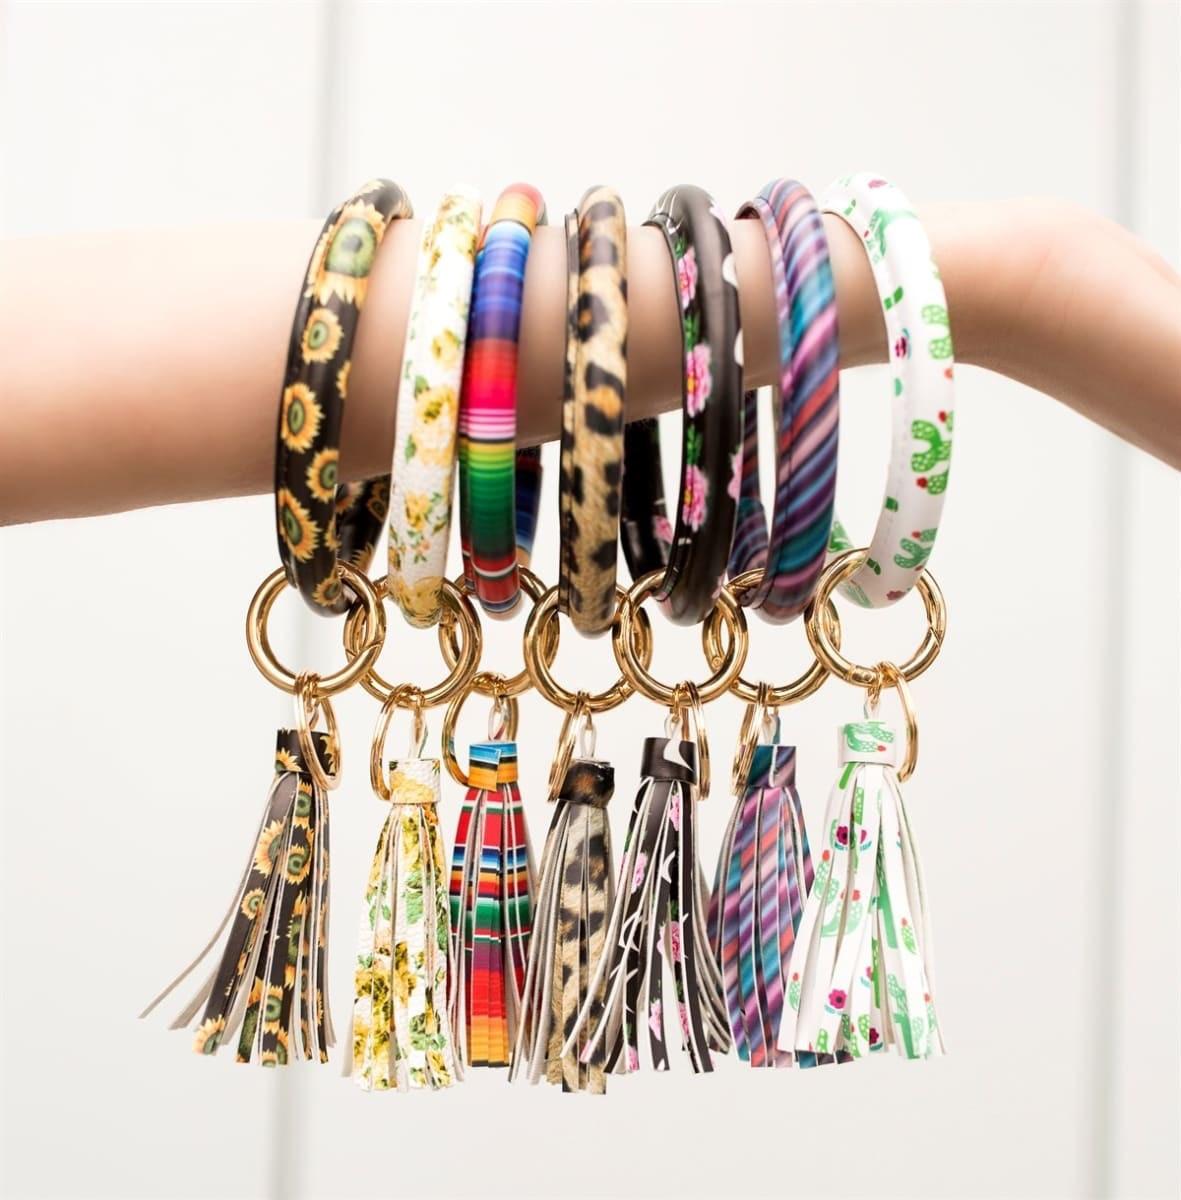 Armband Damen Legierungen Schmuck Edelstahl Strass Armbänder Einstellbar mode